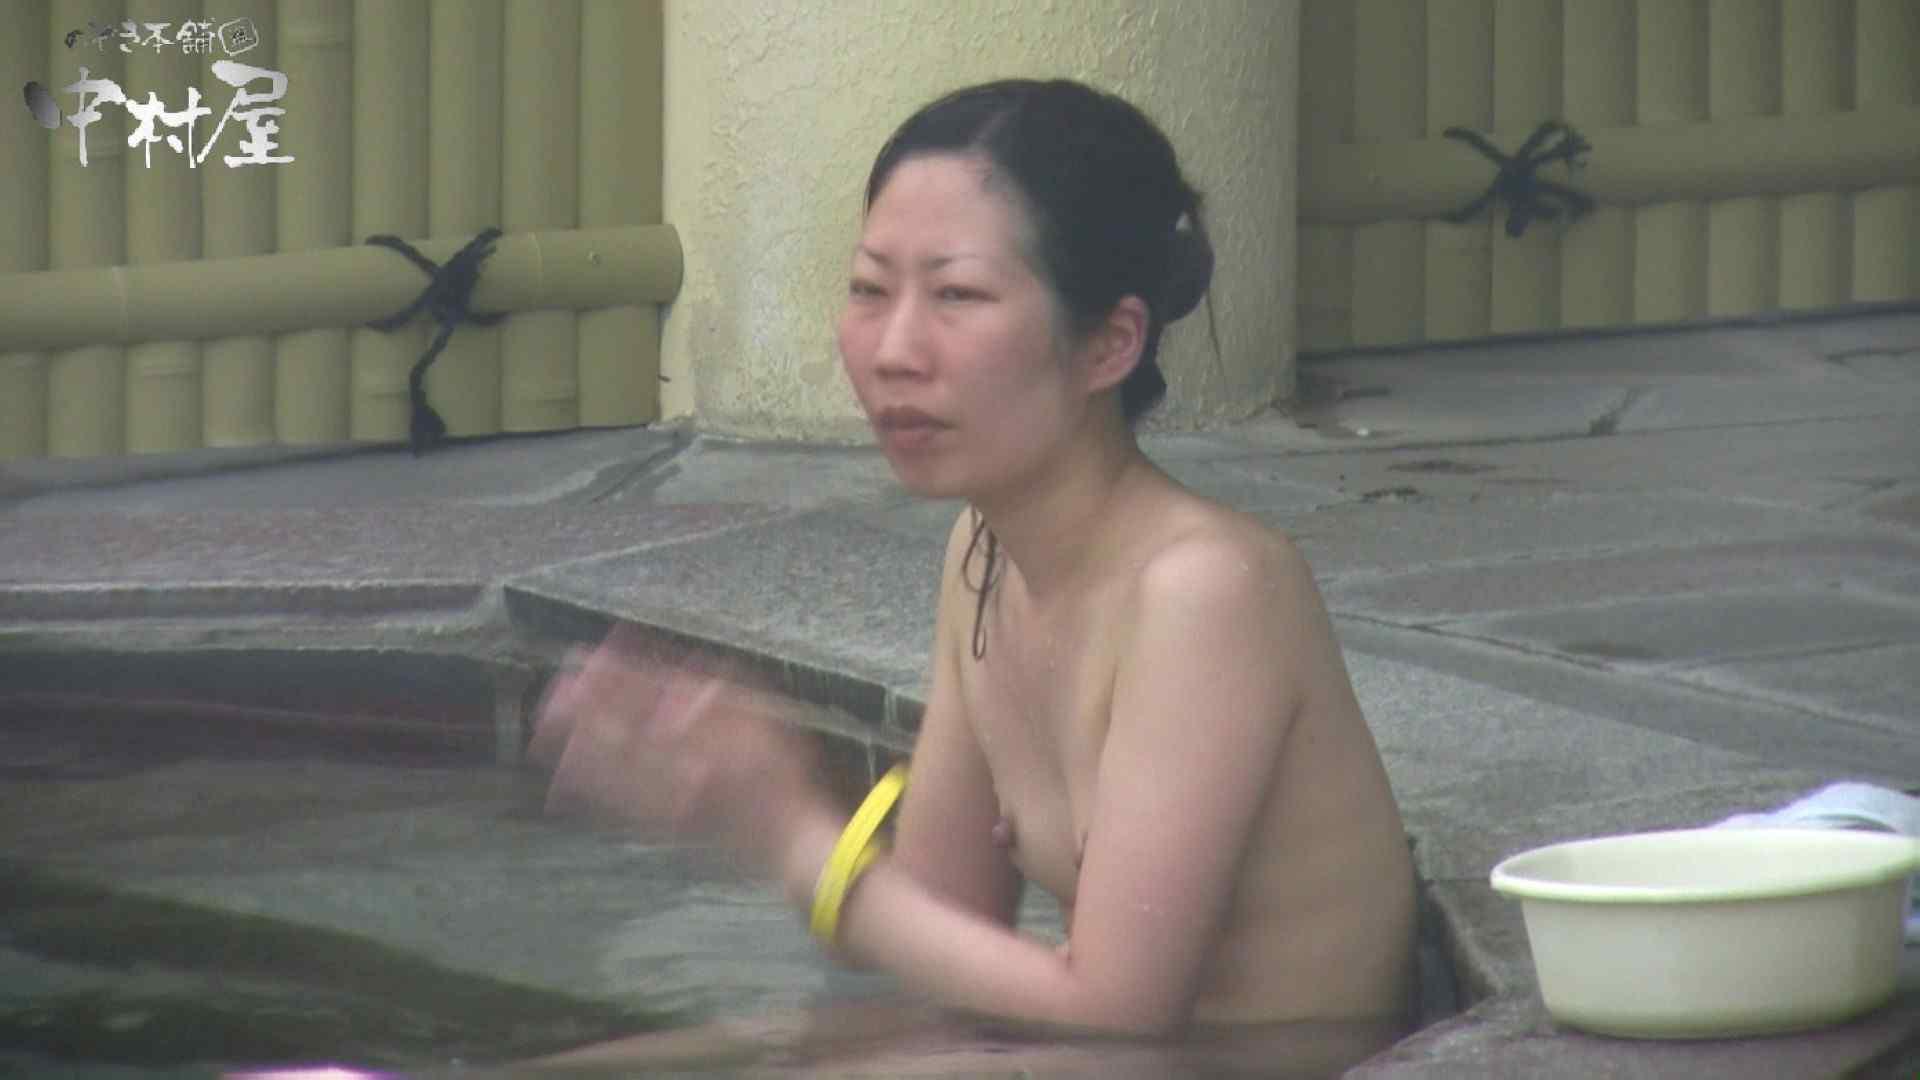 Aquaな露天風呂Vol.883 盗撮特撮  10pic 9